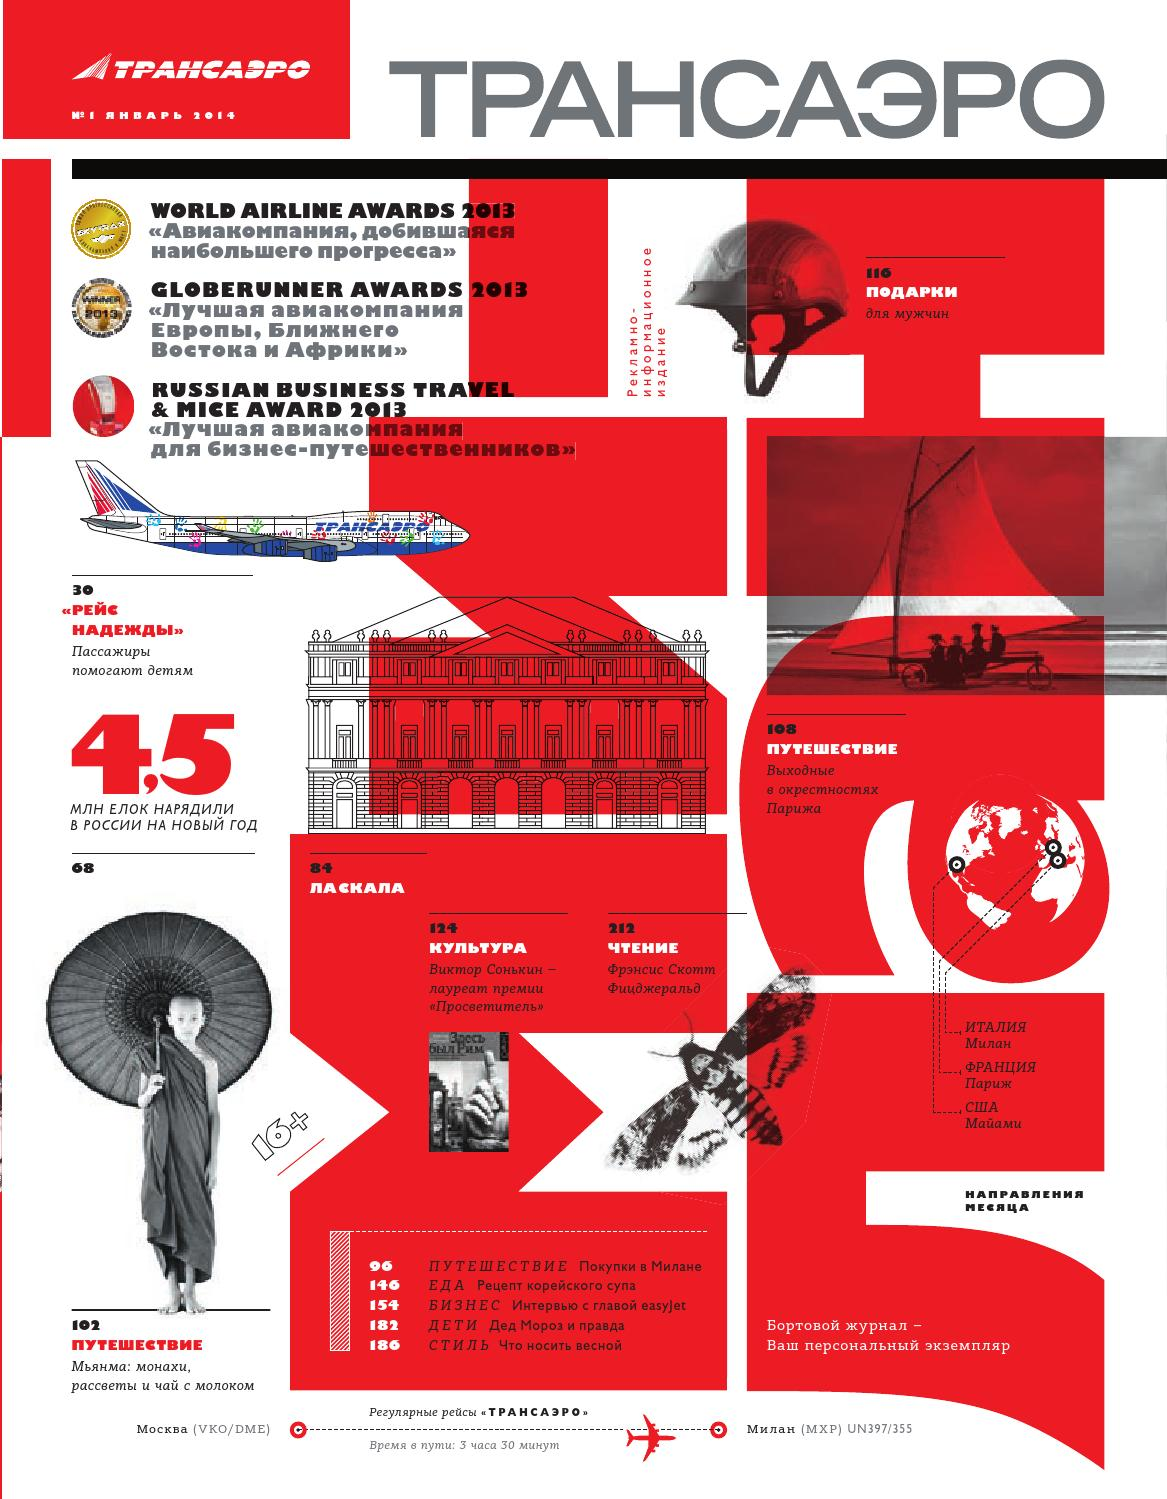 8f3979df8 Transaero Magazine #01 2014 by TA Magazine - issuu